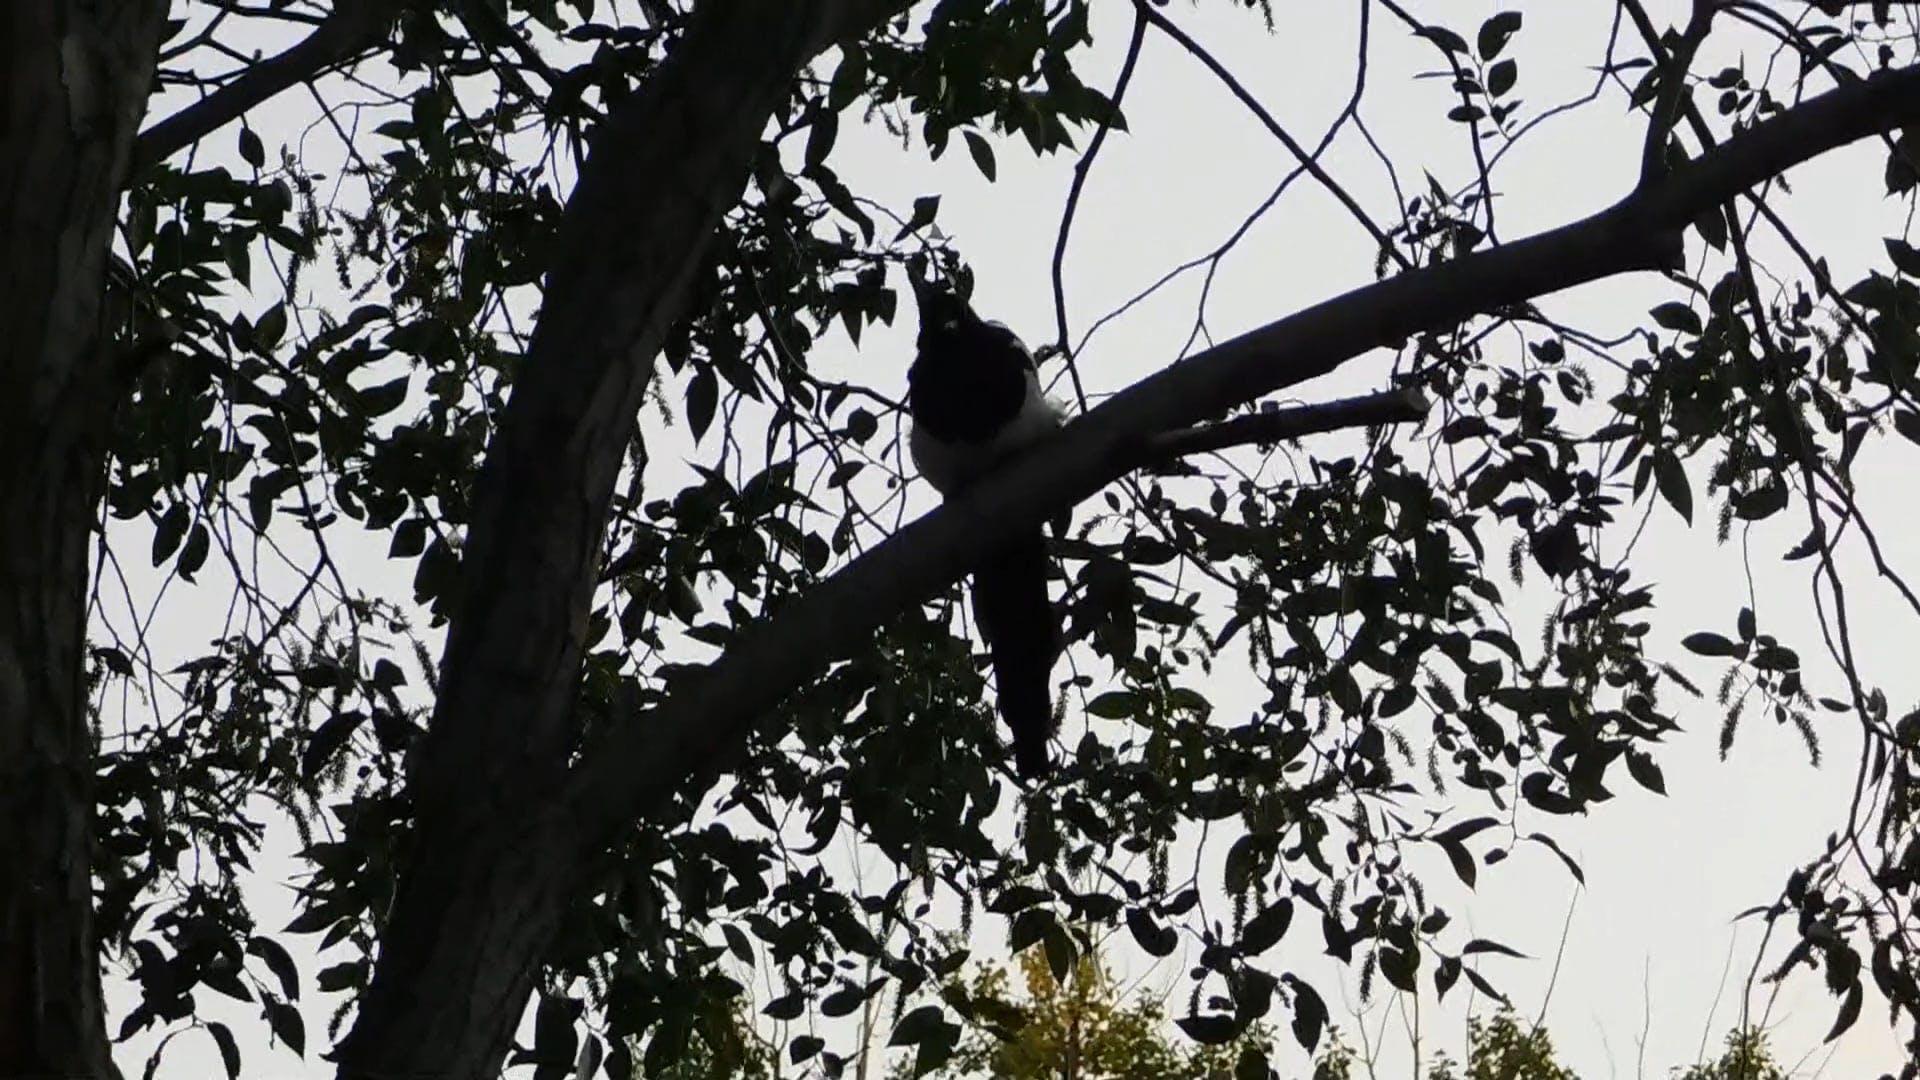 At The Dusk-Bird Watching